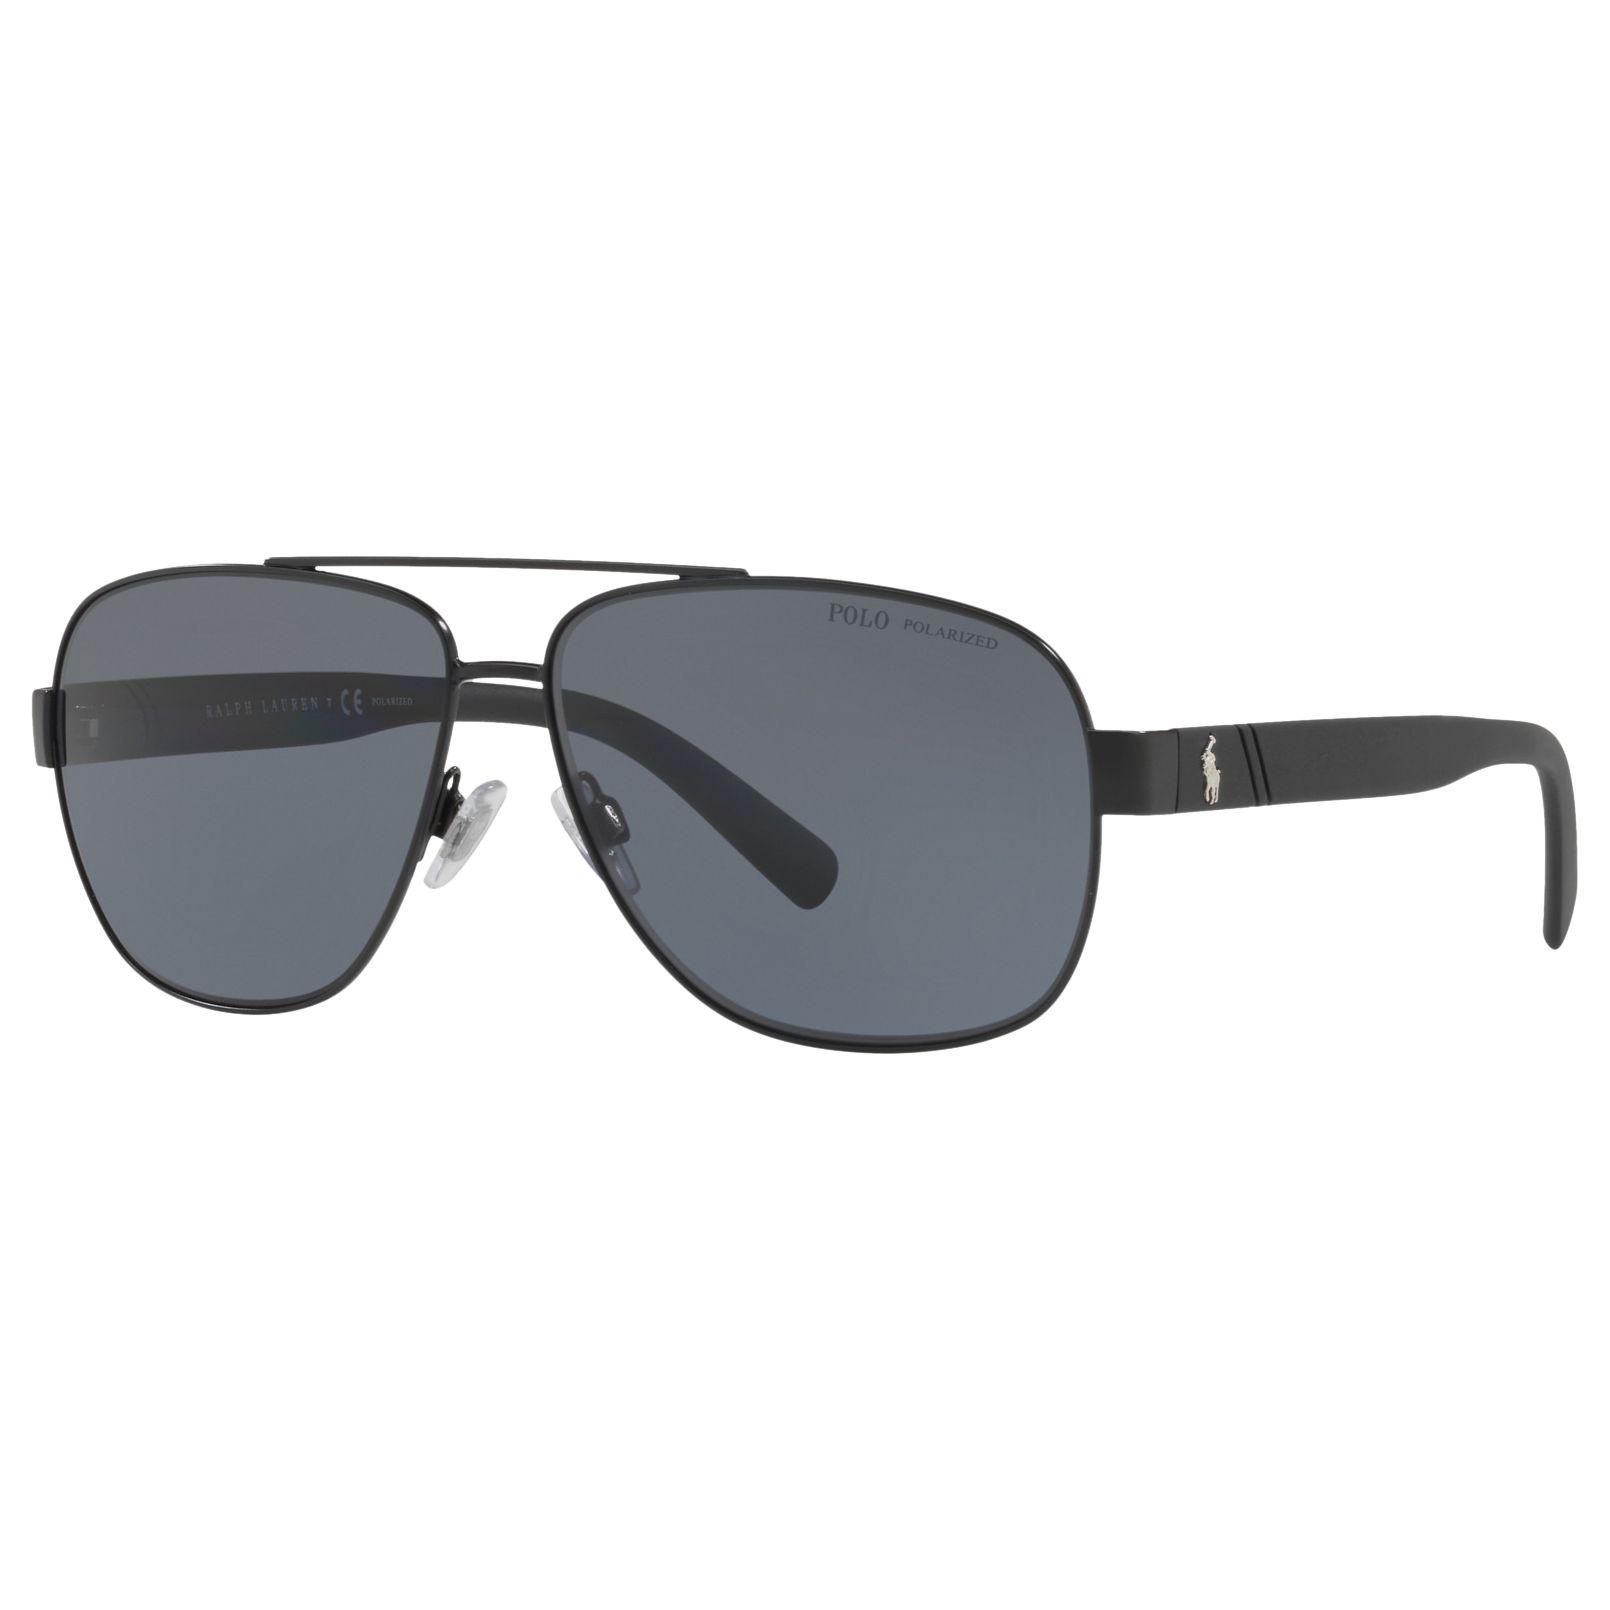 cae0ba73b0f Polo Ralph Lauren PH3110 Men s Polarised Aviator Sunglasses